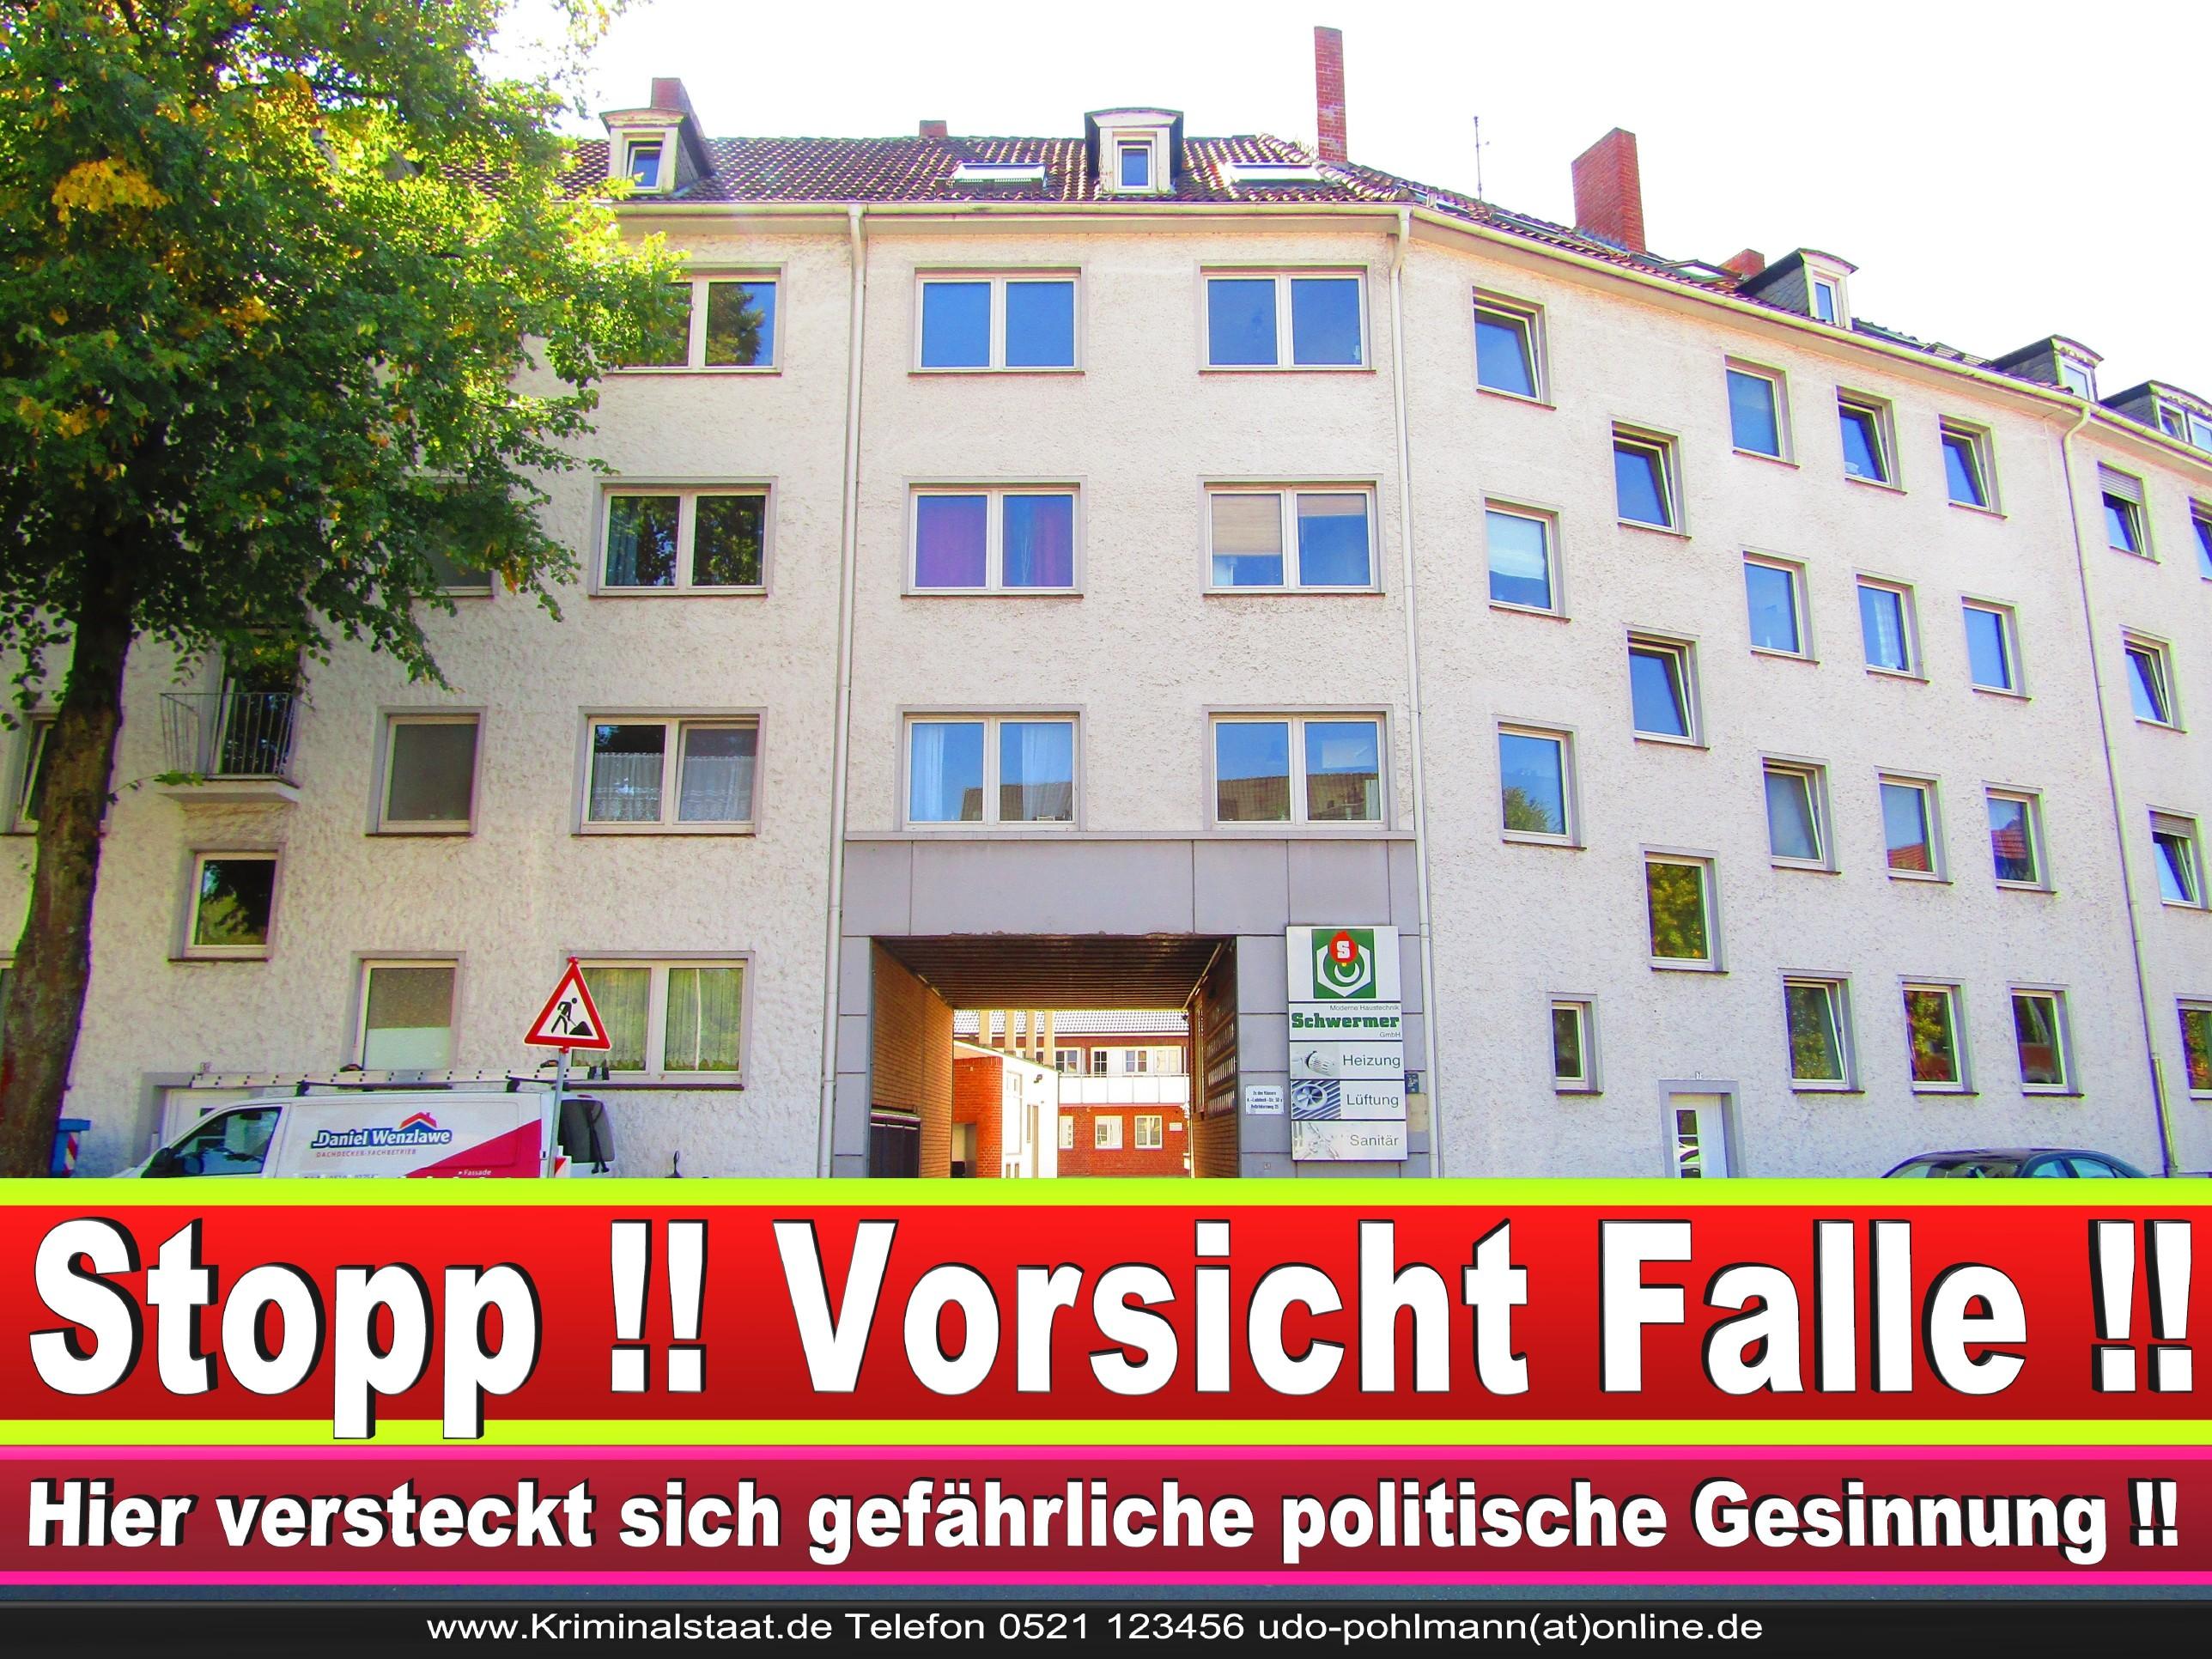 SCHWERMER BIELEFELD HEIZUNG SANITÄR CDU BIELEFELD 10 LANDTAGSWAHL BUNDESTAGSWAHL BÜRGERMEISTERWAHL